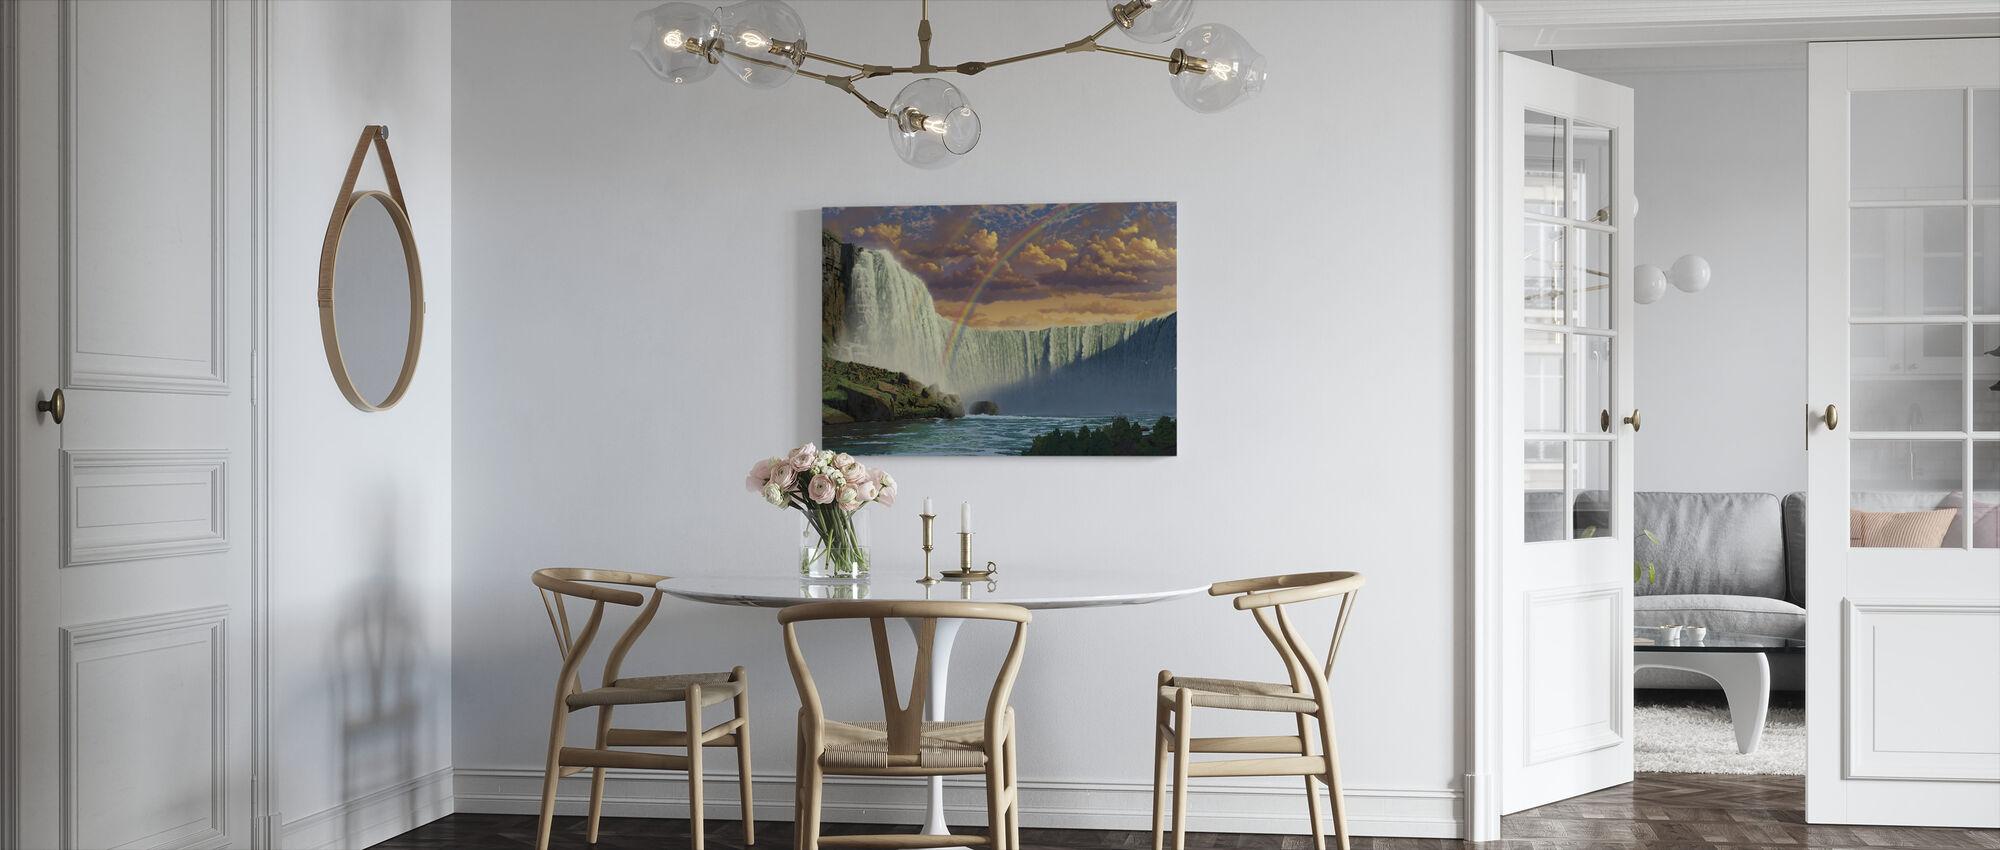 Niagara Falls - Canvas print - Kitchen